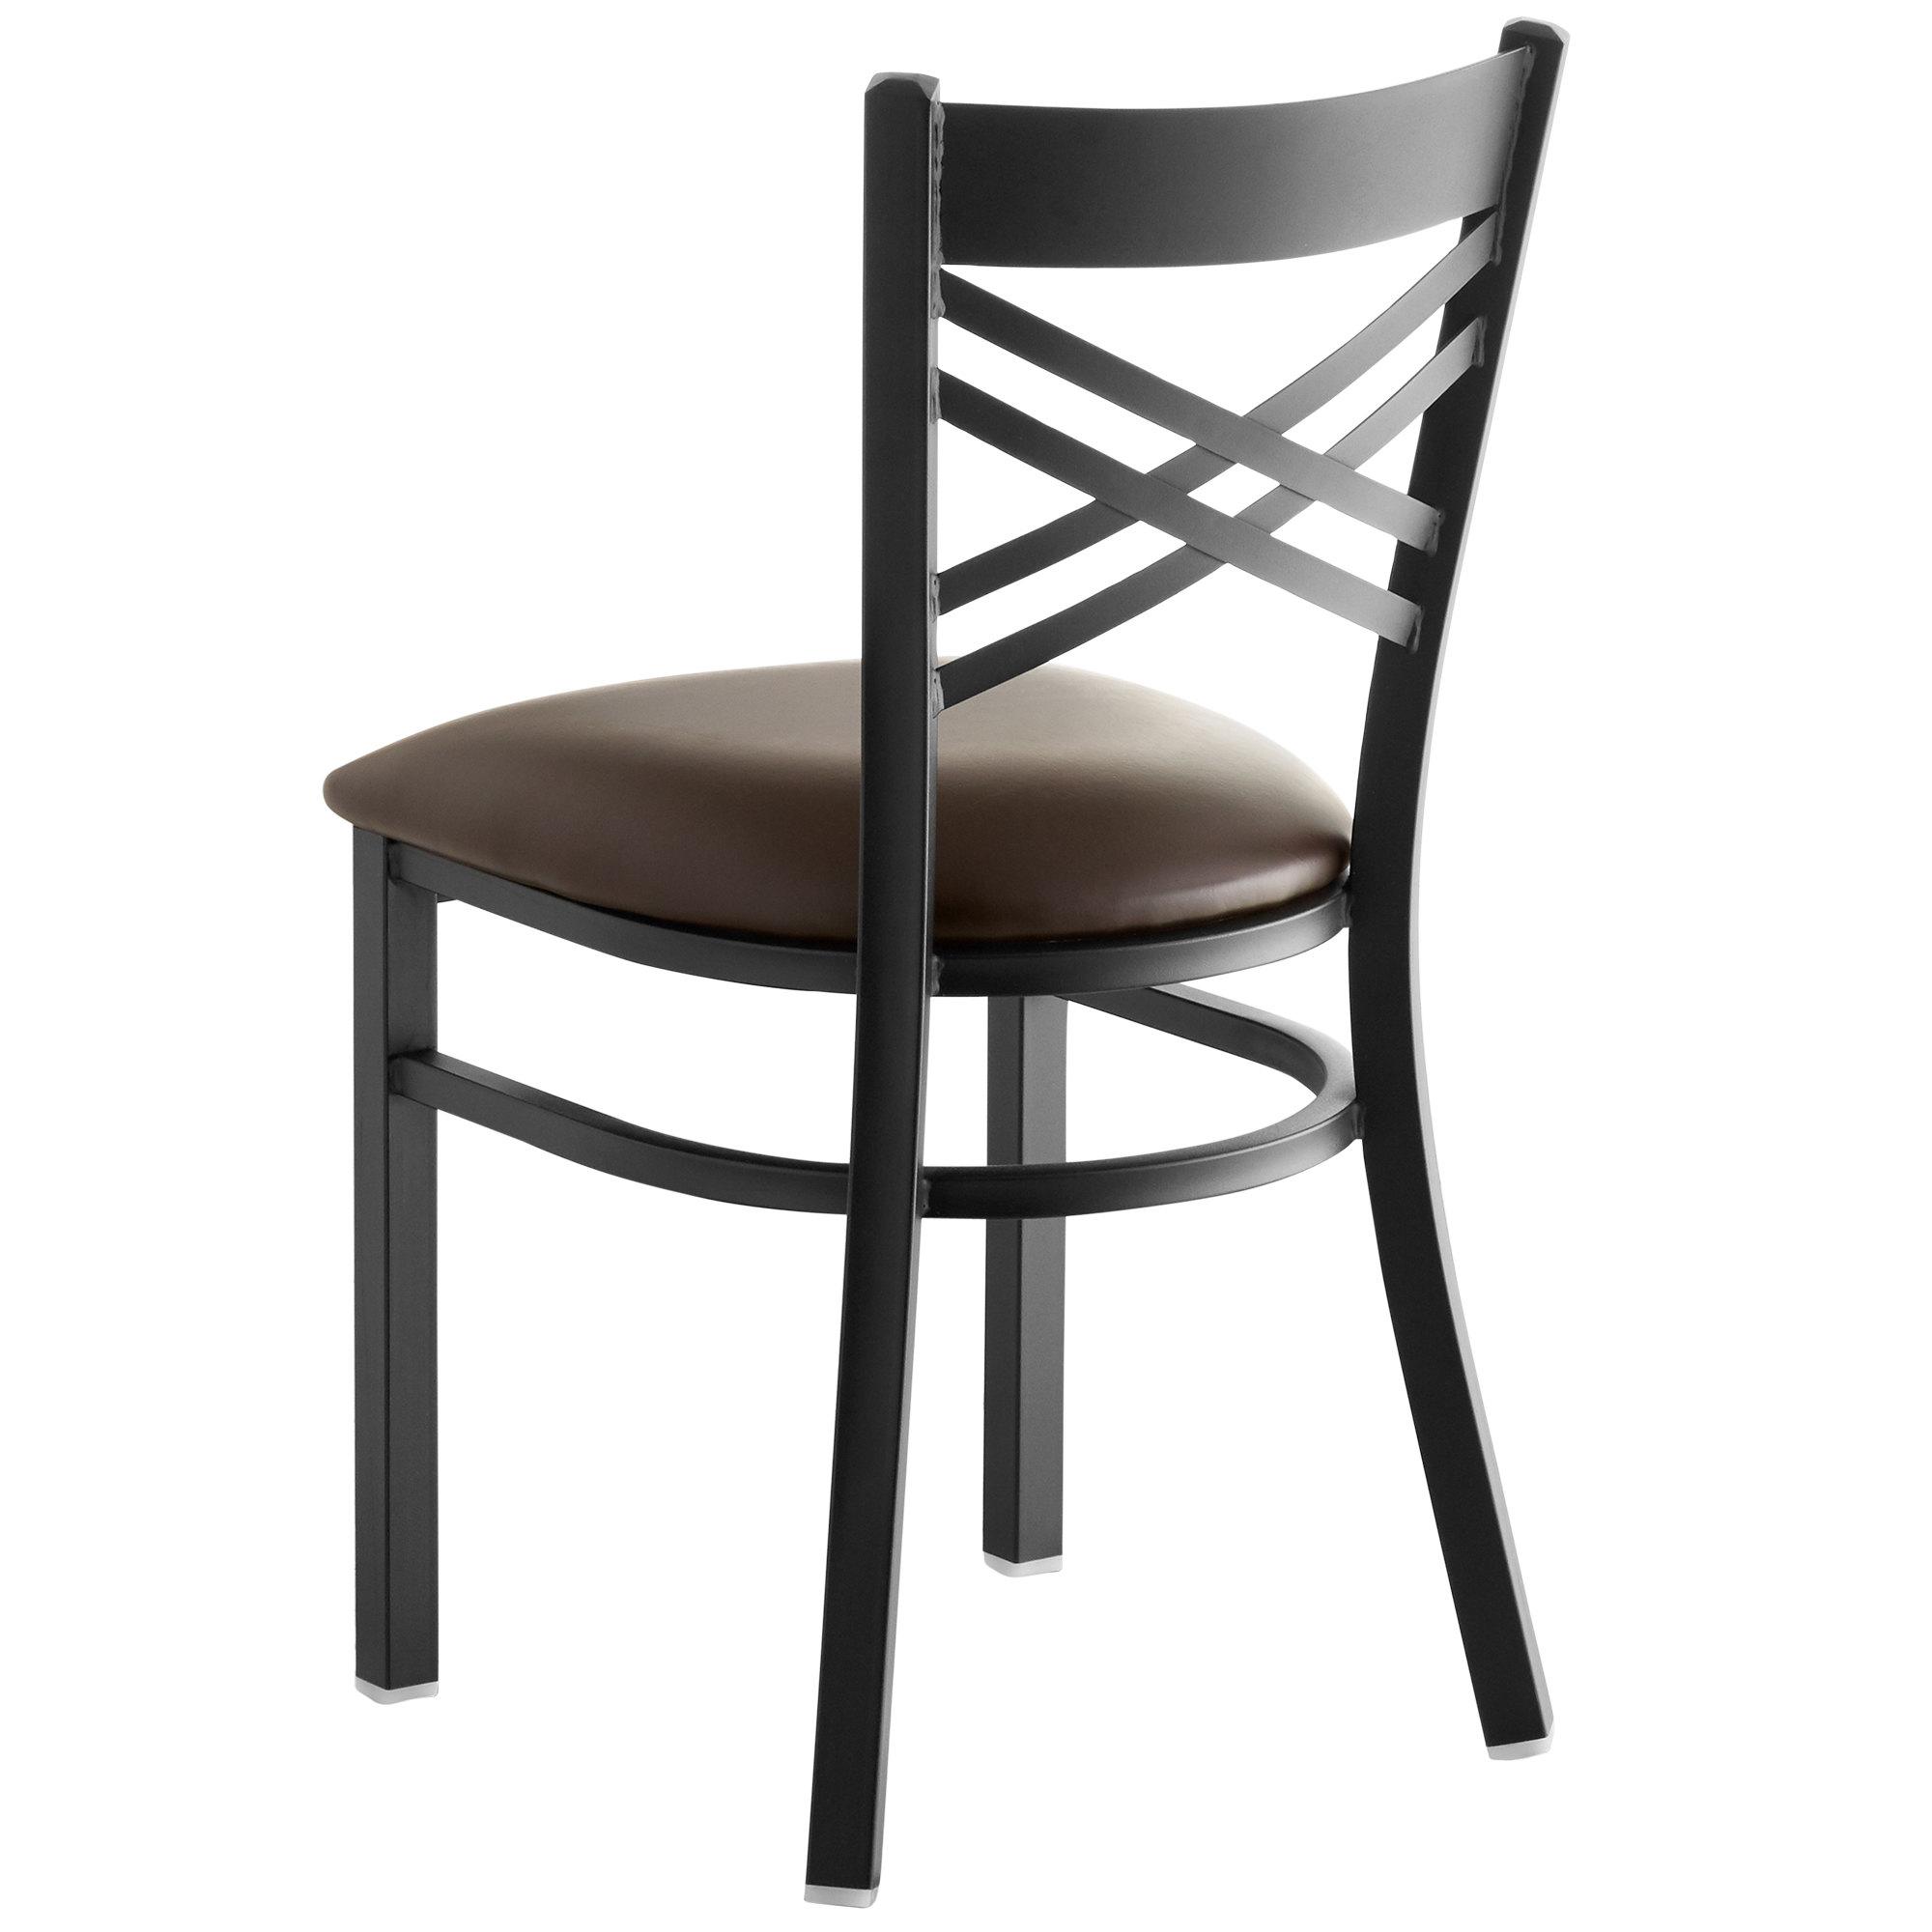 #148 - Black Cross Back Design Restaurant Metal Chair with Dark Brown Vinyl Seat